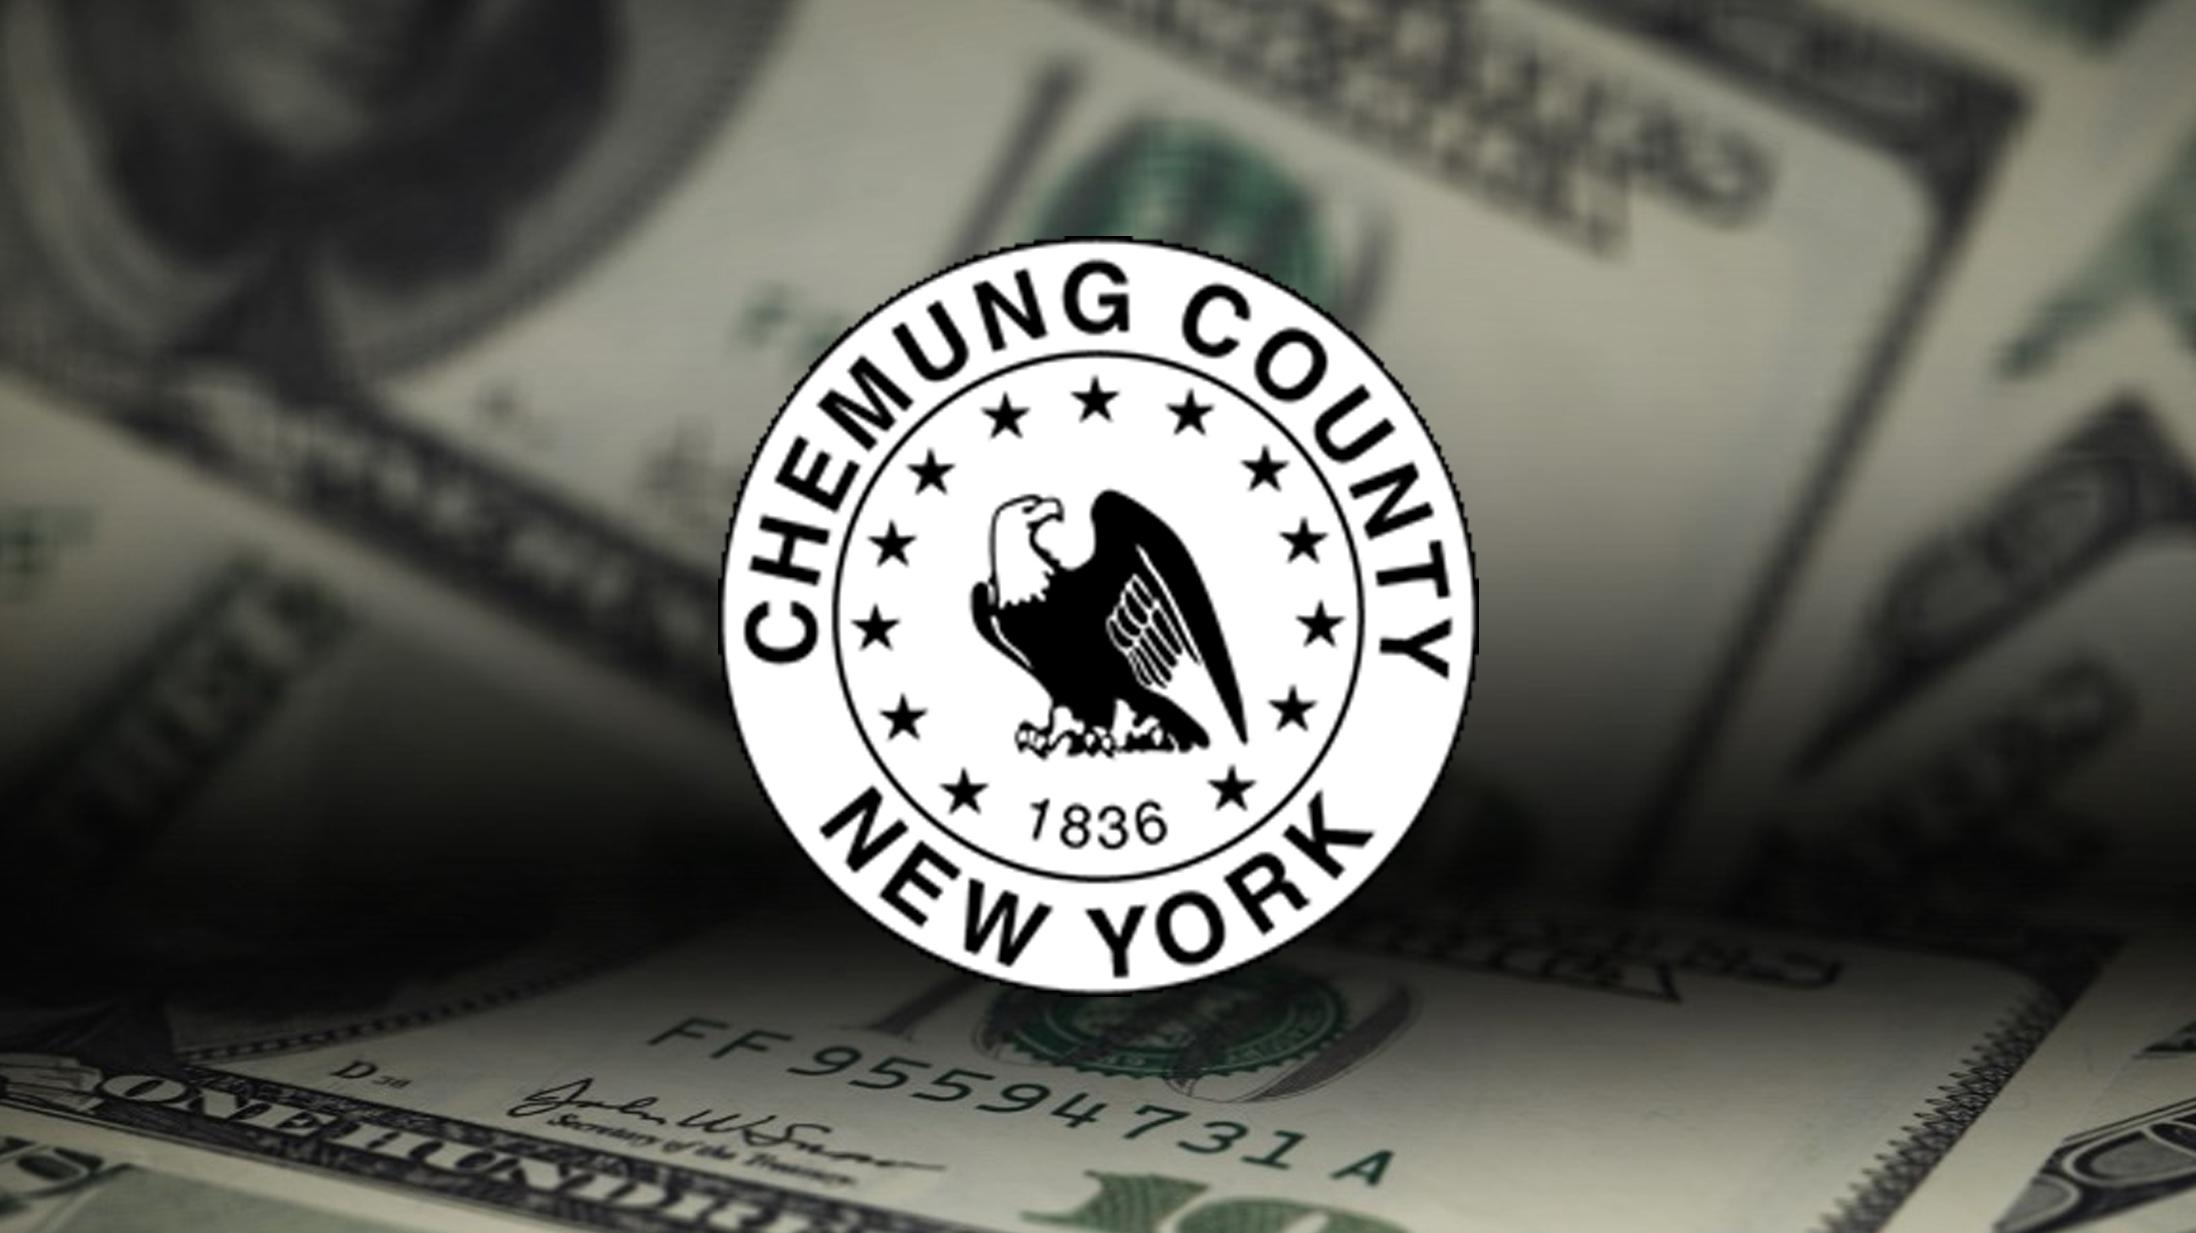 Chemung County Money pic FOR WEB_1481342044896.jpg